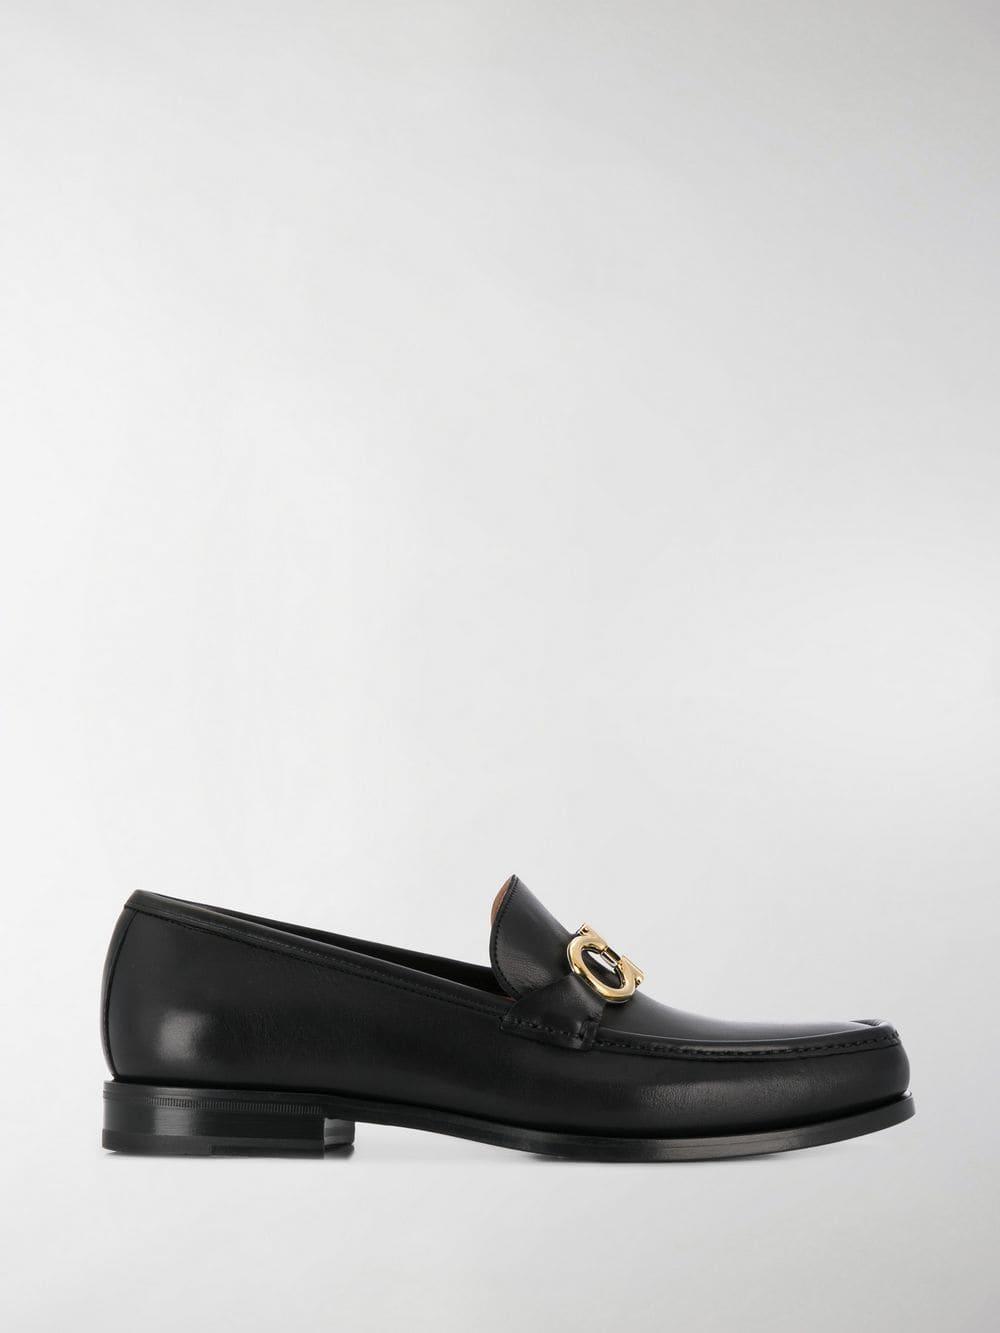 e6906c277794c Ferragamo Vintage Loafers in Black for Men - Lyst